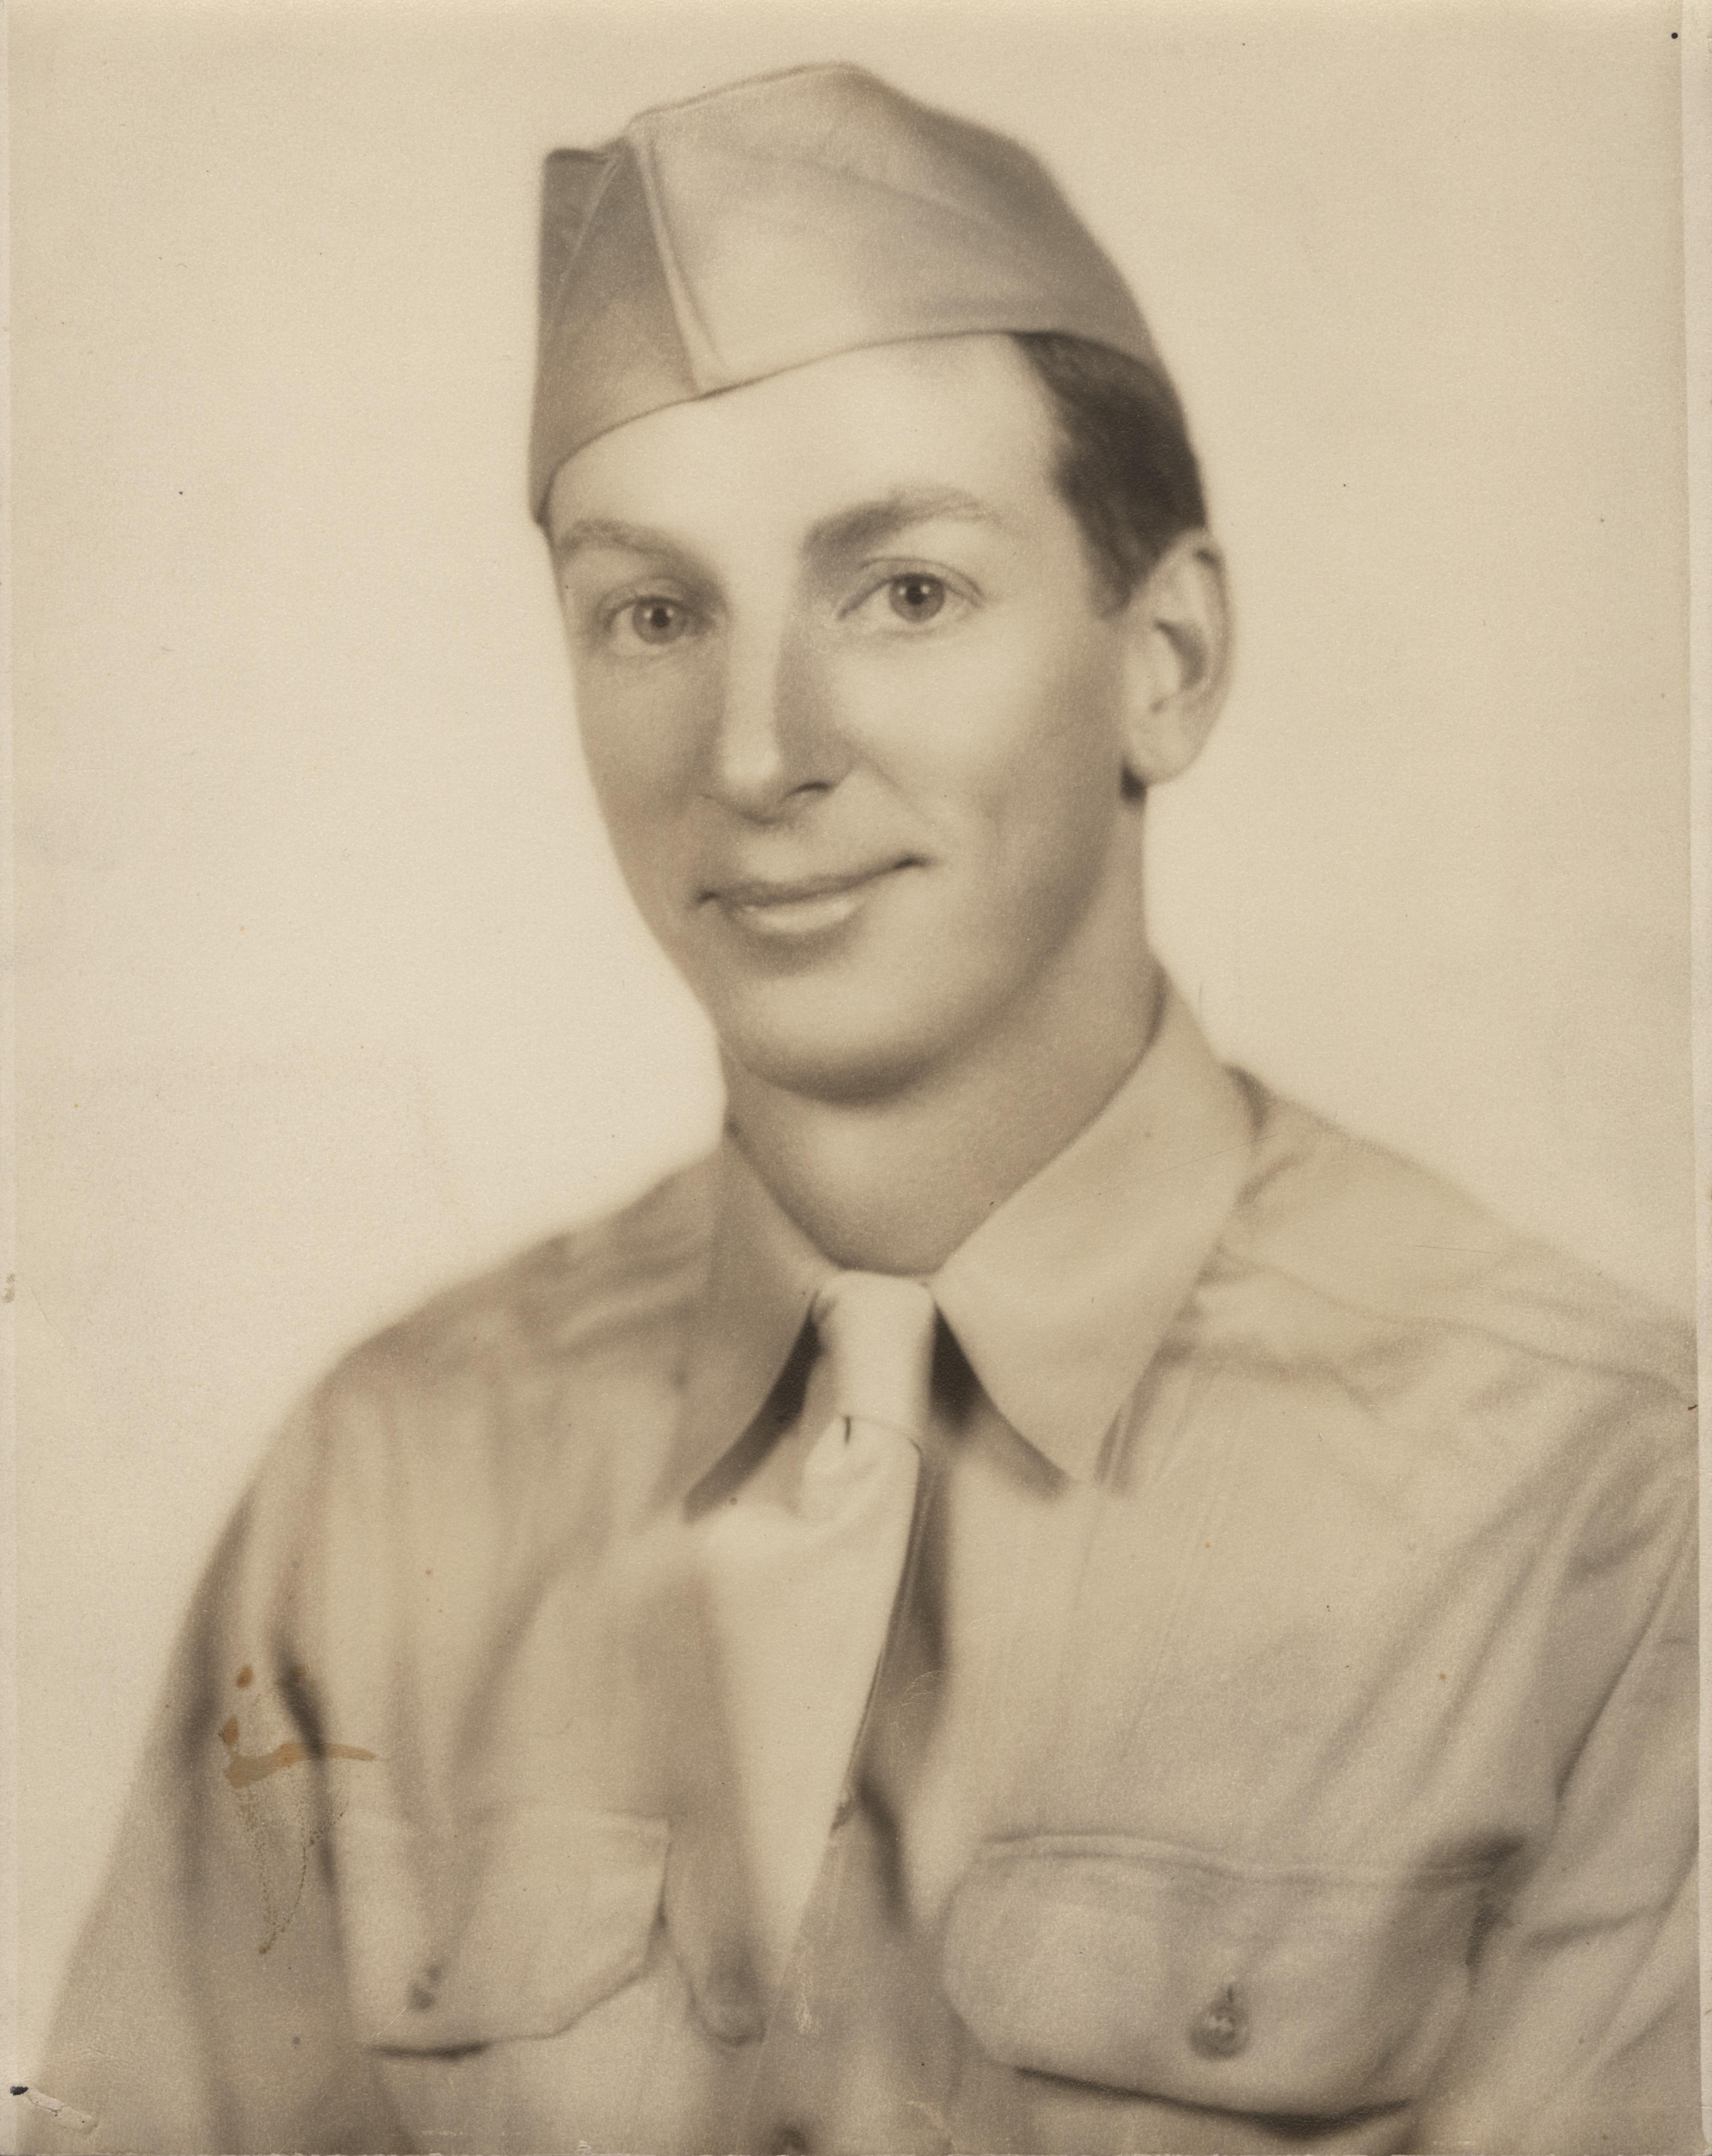 Fred Kitson circa late 1944